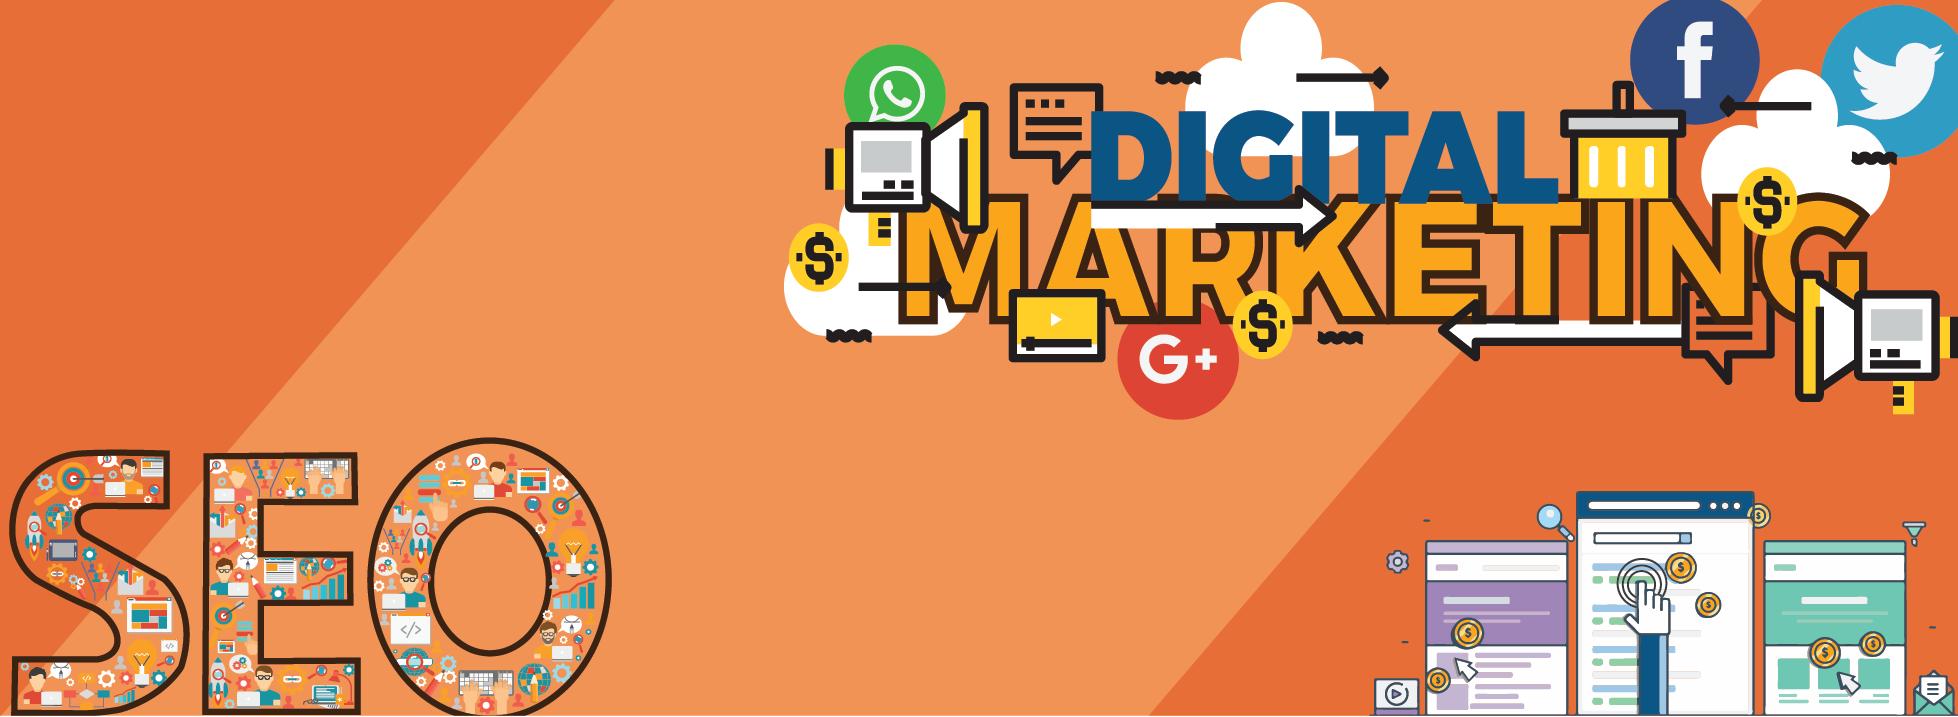 Digital-Marketing-Training-in-Delhi-NCR